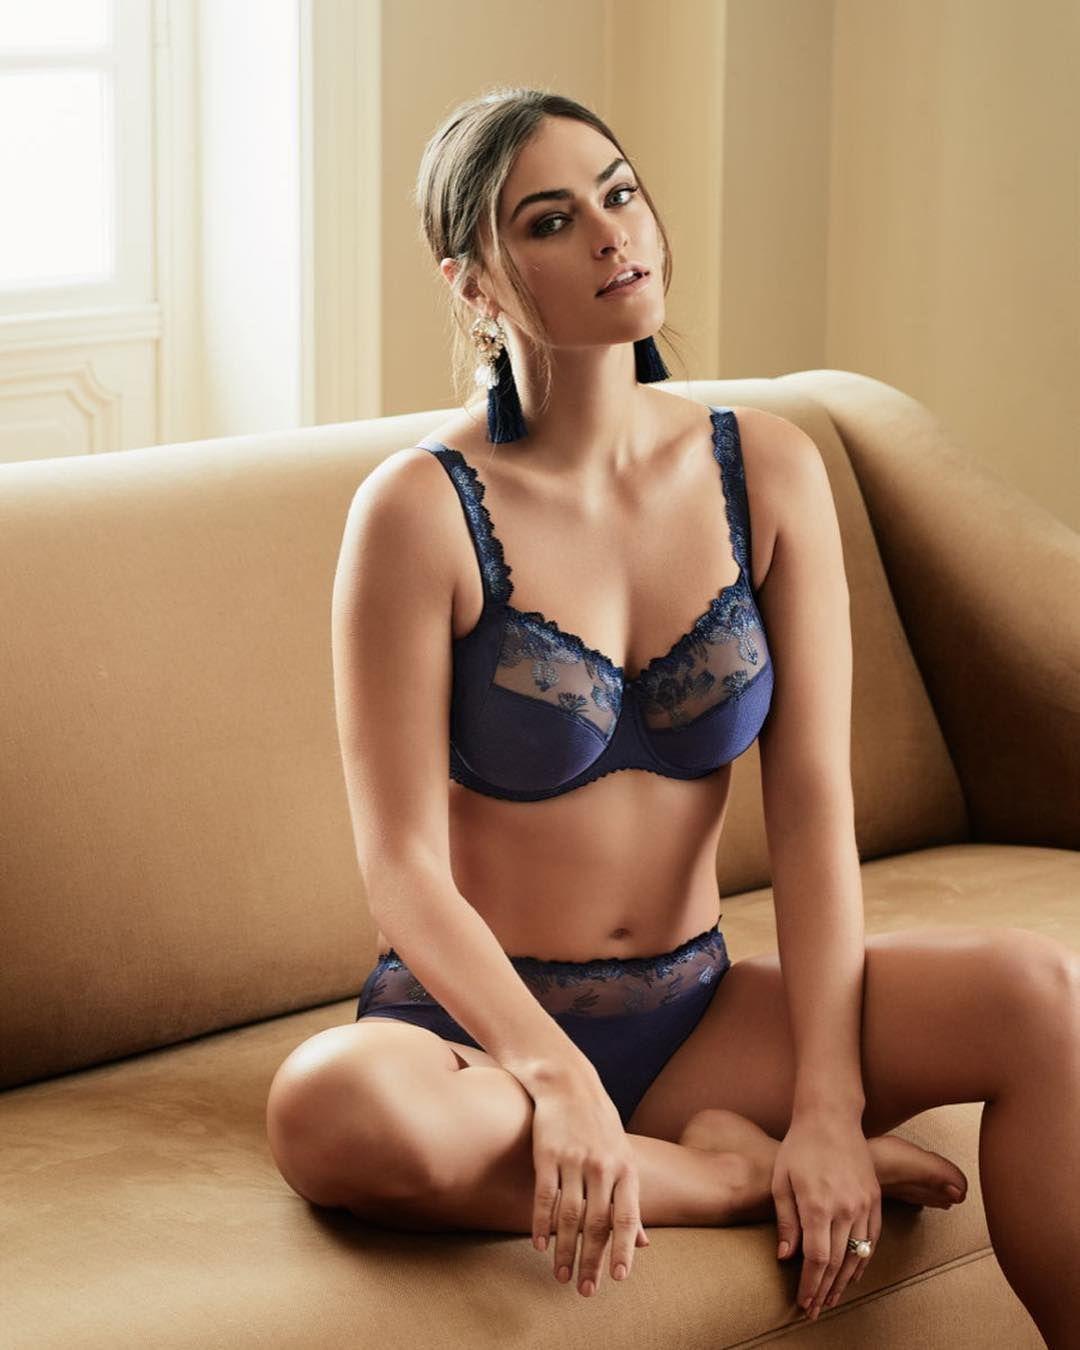 Model Myla Dalbesio is wearing a plume-bleu-bijou-komfort-set from Prima  Donna 845994e0cfb